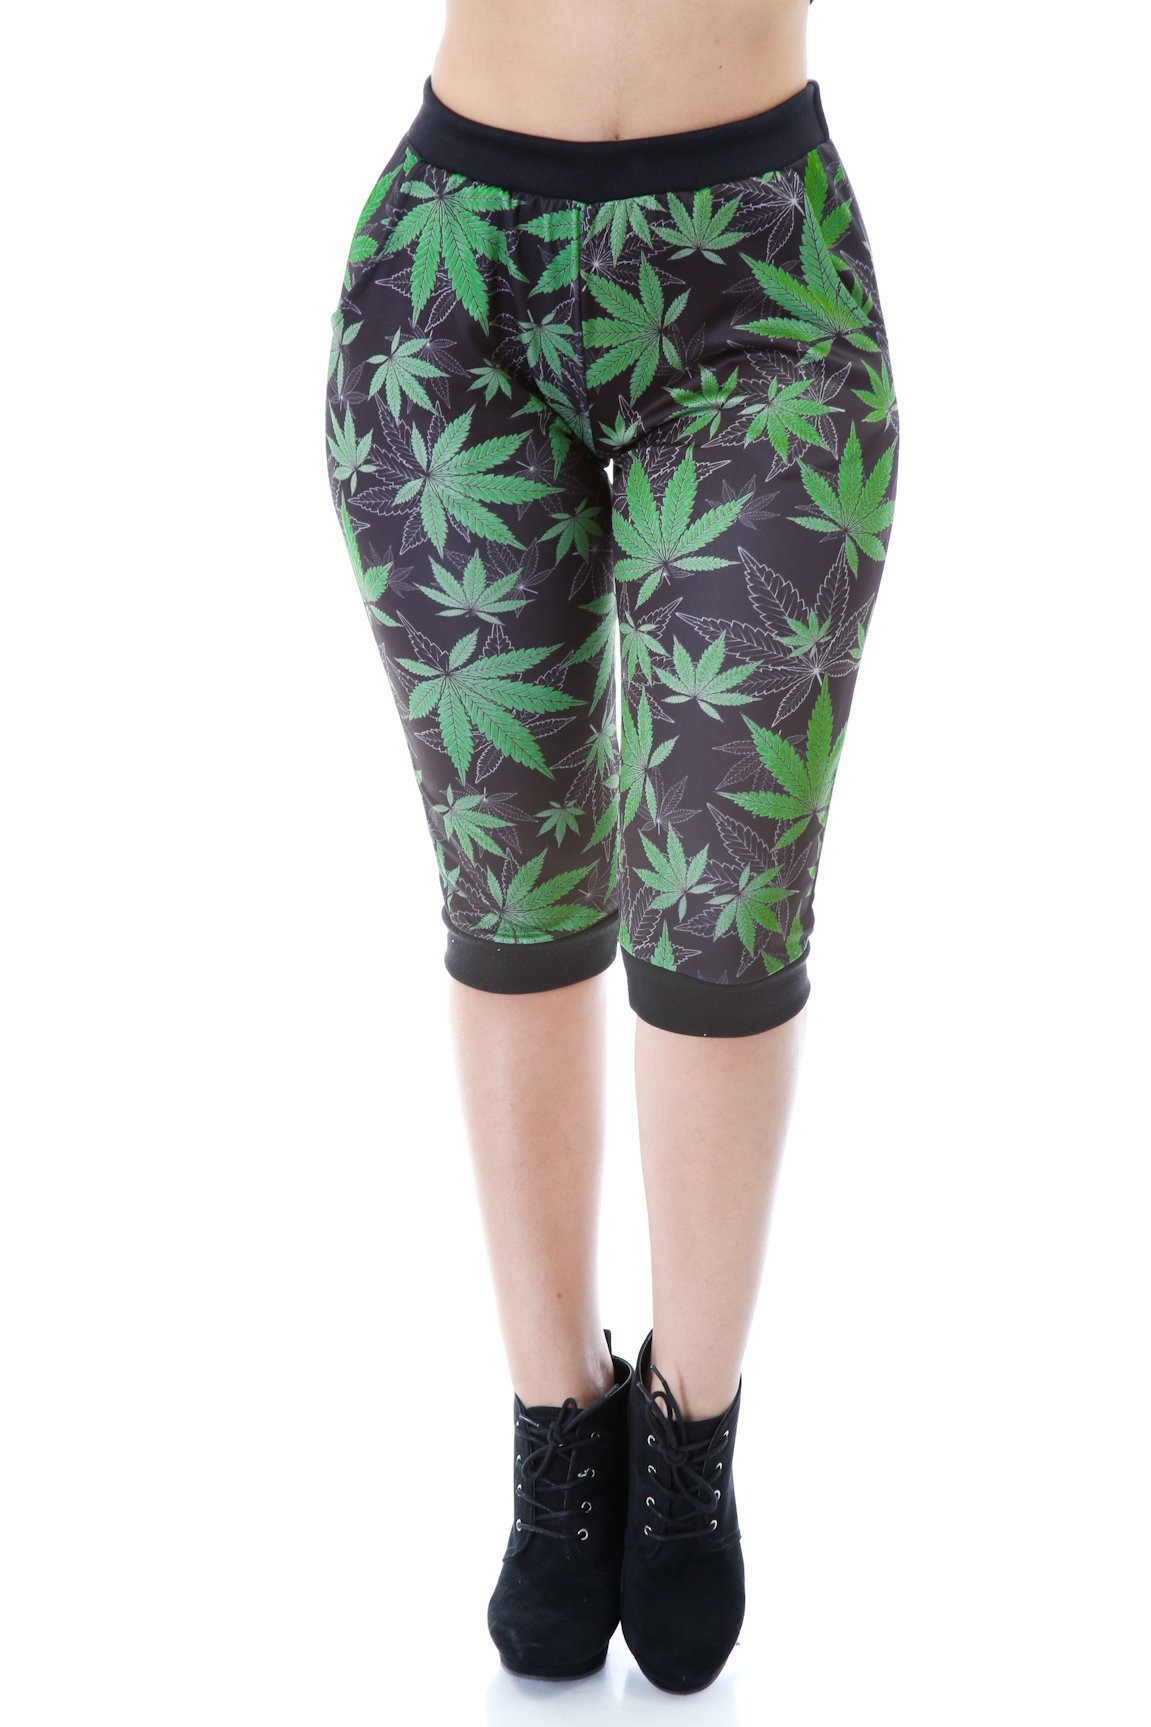 Free Cannabis Pants